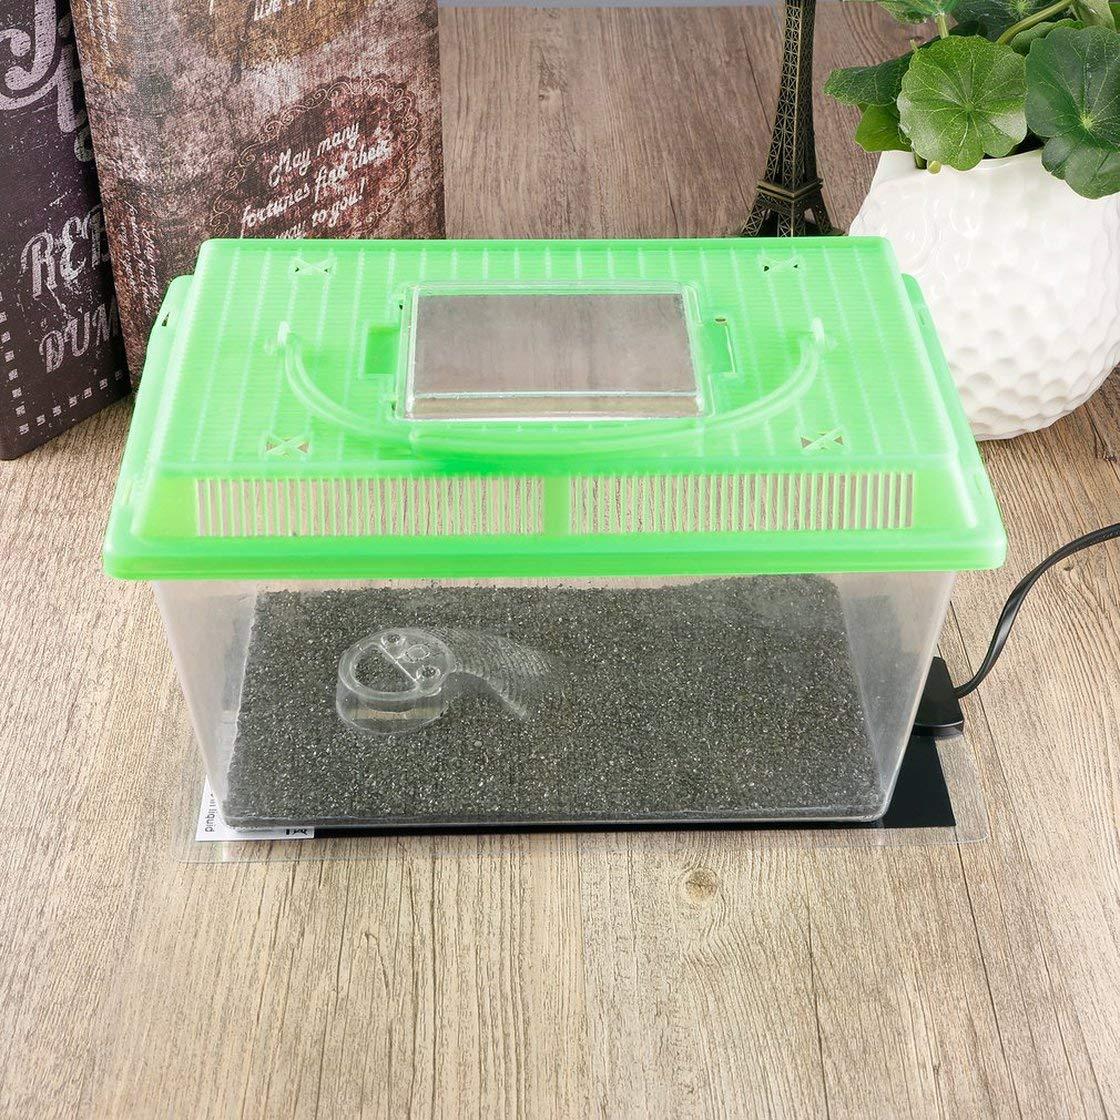 Gwendoll Alfombrilla calefactora de dise/ño Extra Fino 15 x 28 cm Incubadora de cr/ía de Reptiles Almohadilla calefactora para Mascotas Brew EU 220V-240V para Cama de Gatos